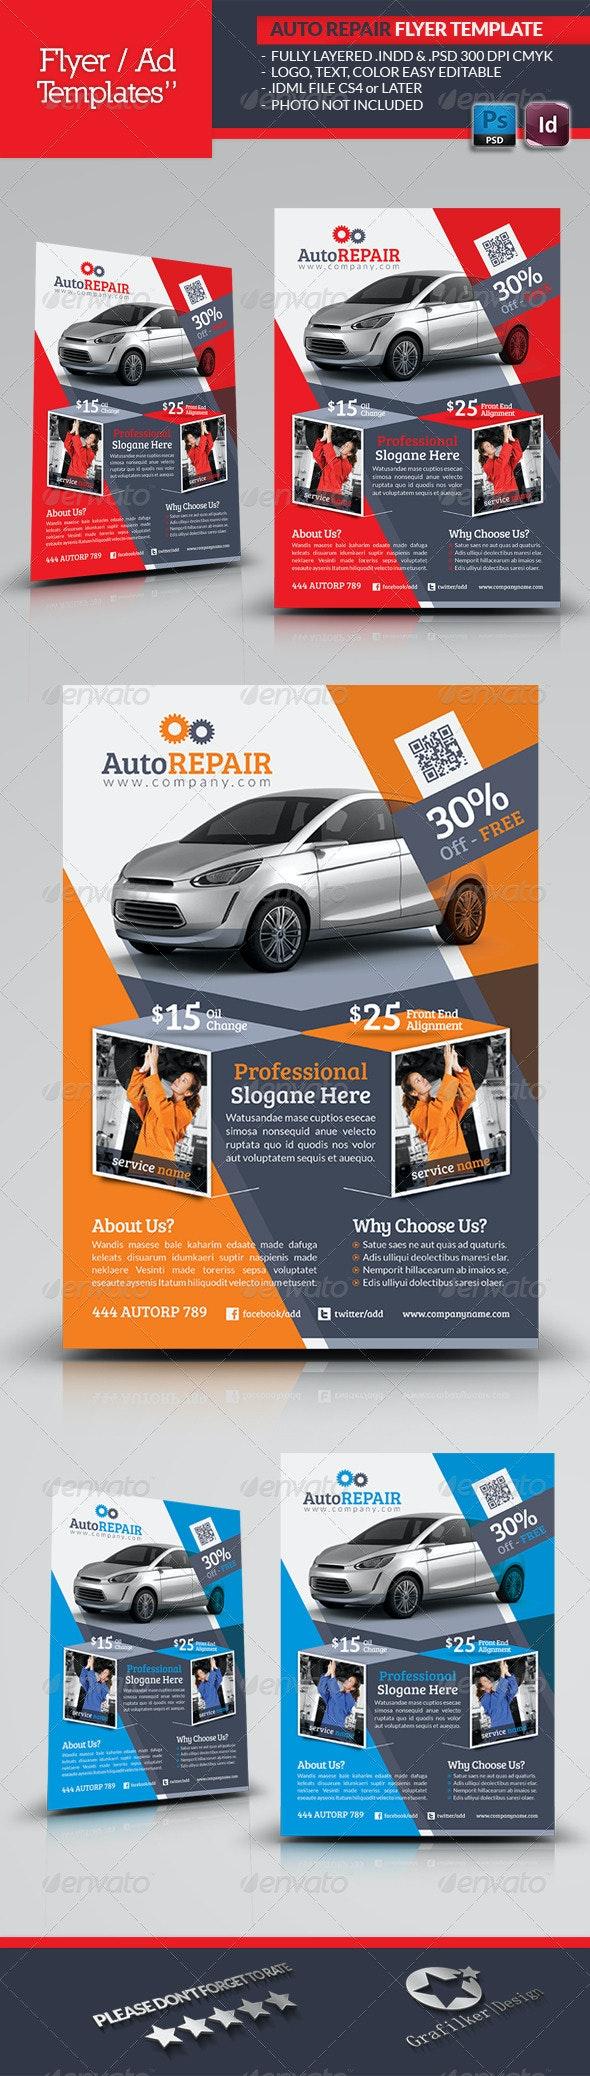 Automobile Repair Flyer Template - Corporate Flyers